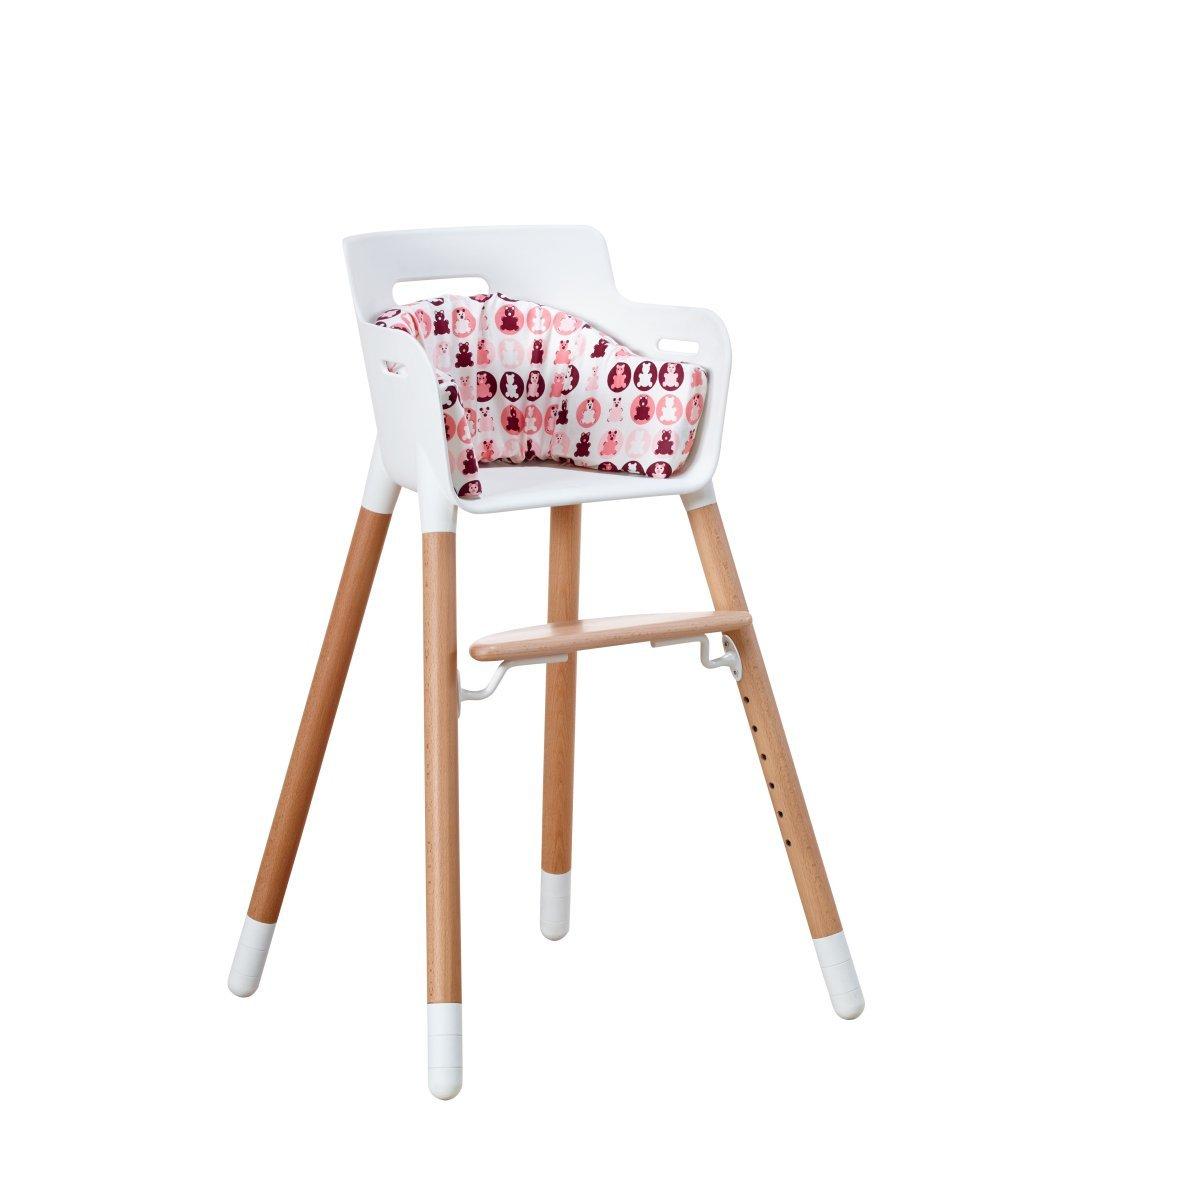 flexa baby hochstuhl 82 10020 1 149. Black Bedroom Furniture Sets. Home Design Ideas